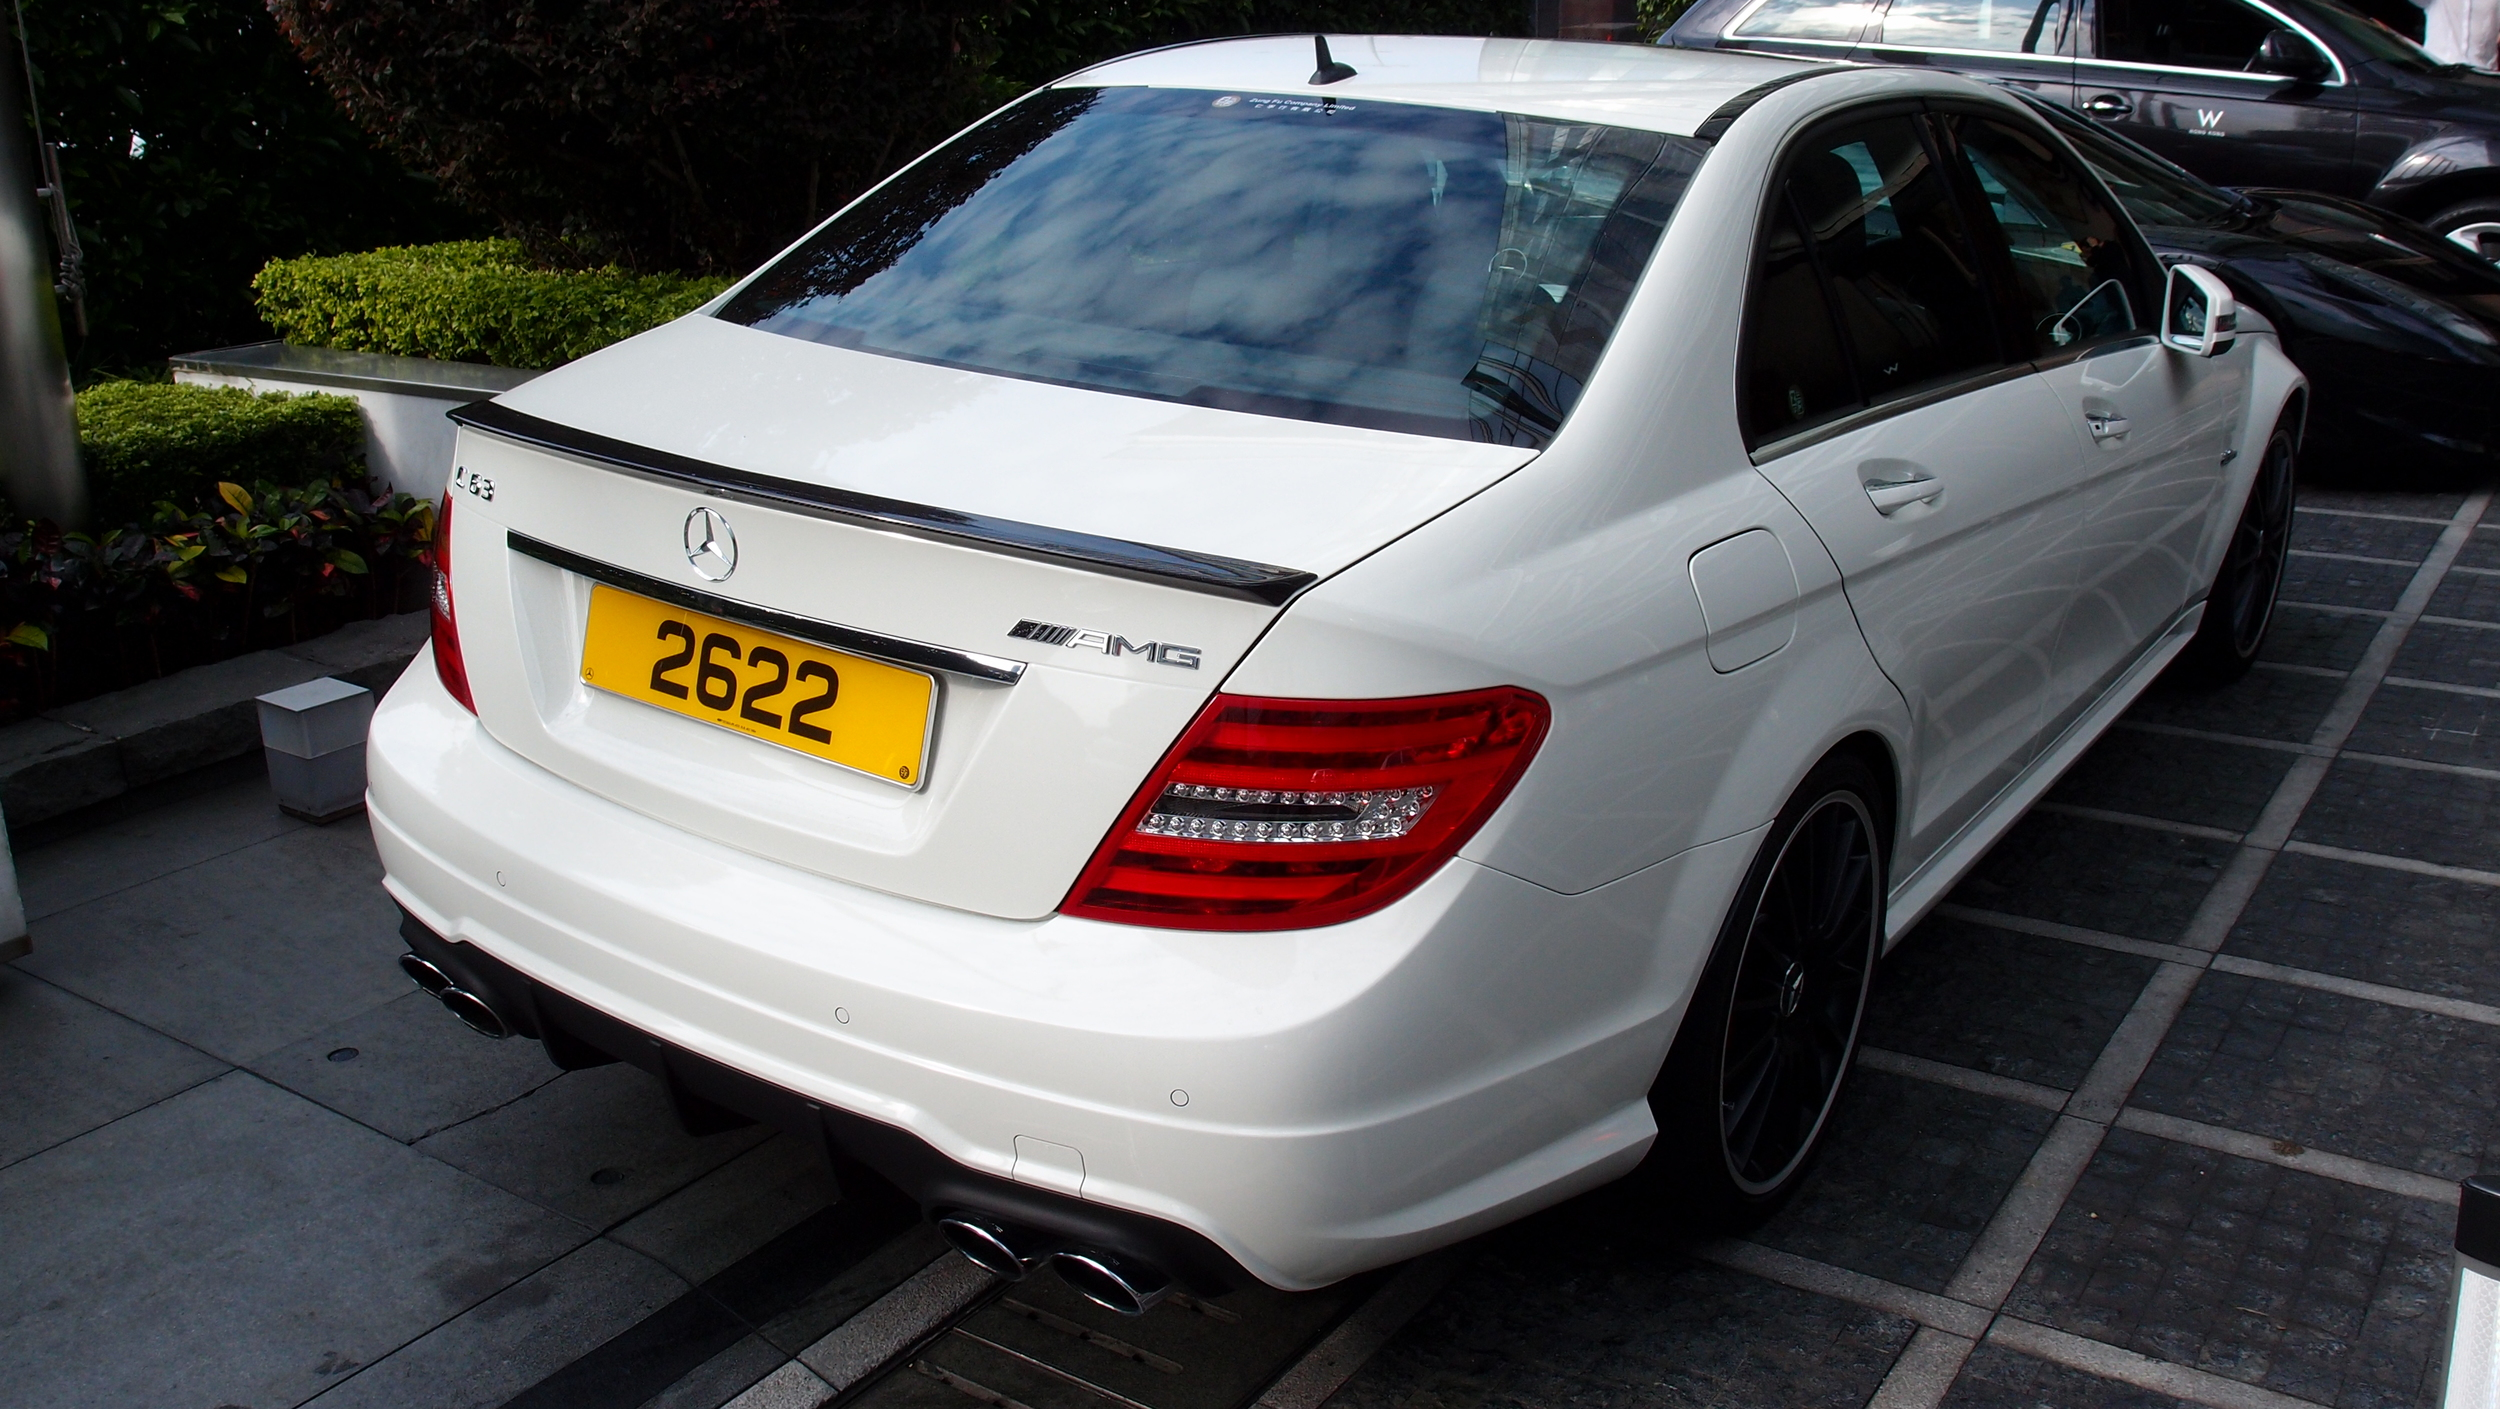 Mercedes AMG supercar